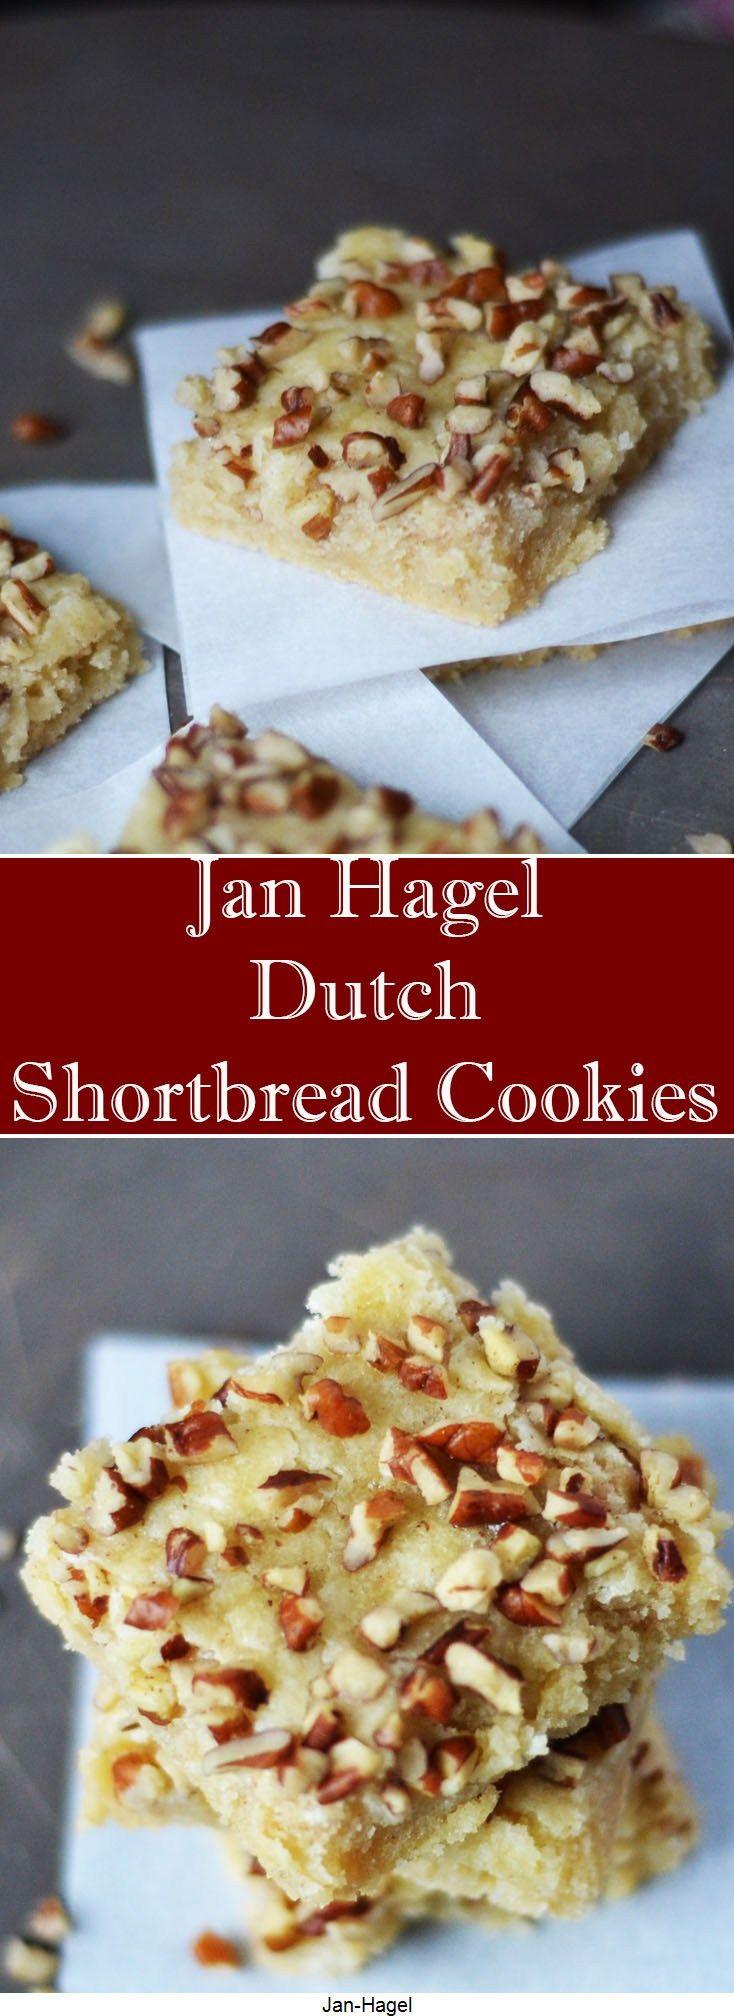 Jan Hagel Dutch Shortbread Cookies #HousefulOfCookies